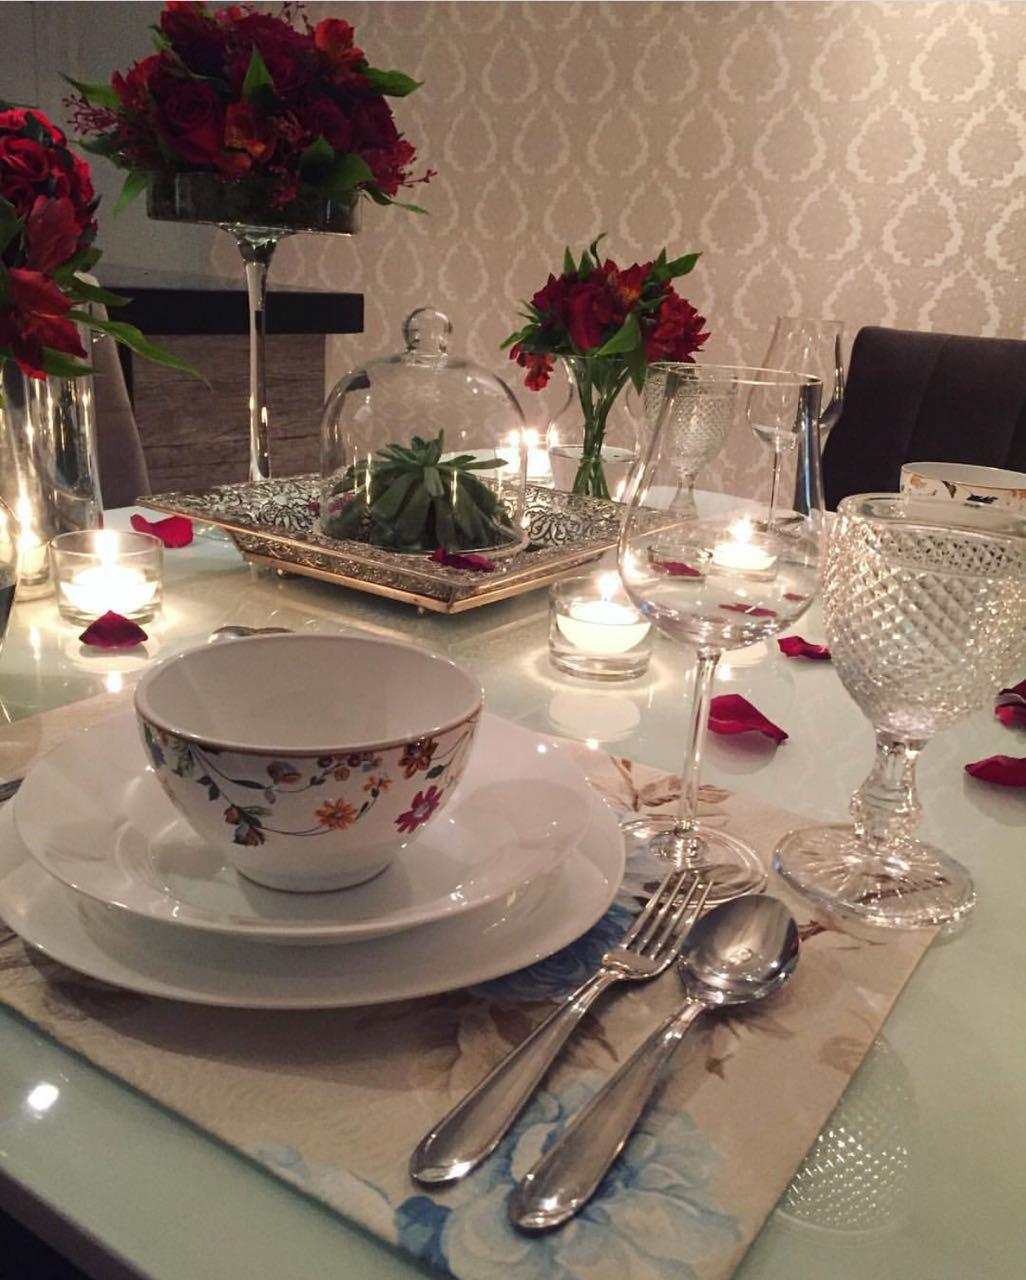 Mesa de jantar do dia dos namorados